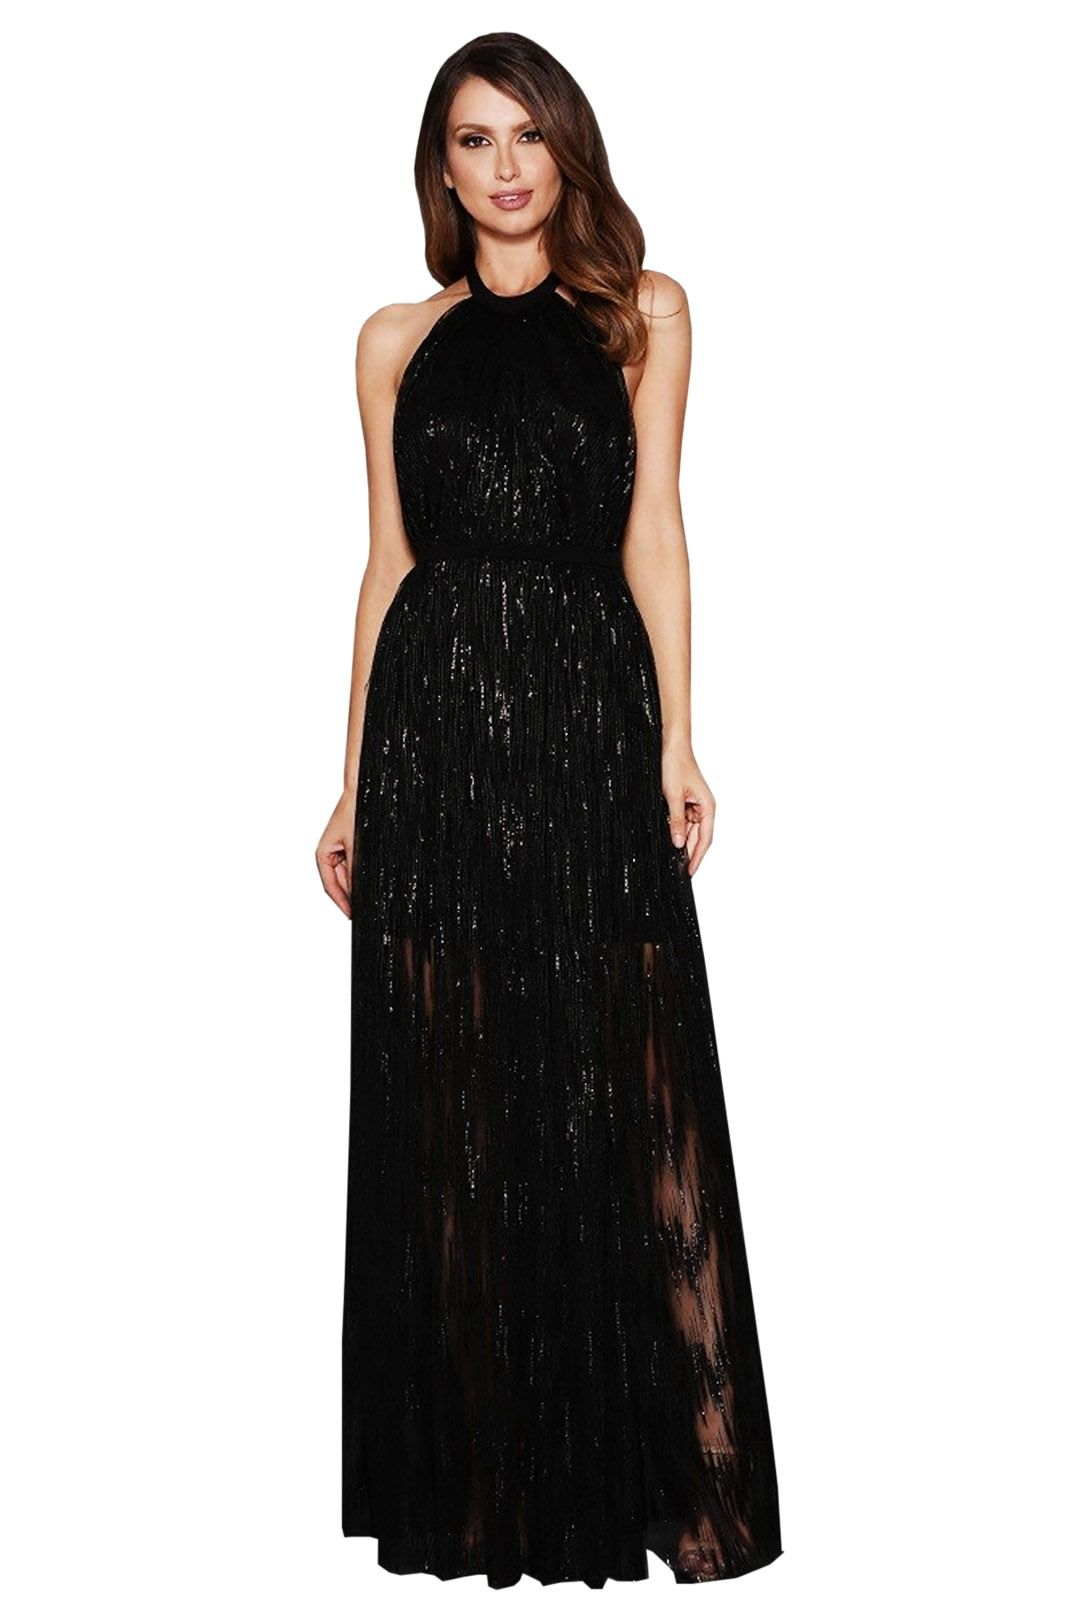 Elle Zeitoune - Gwyneth Gown - Black - Front